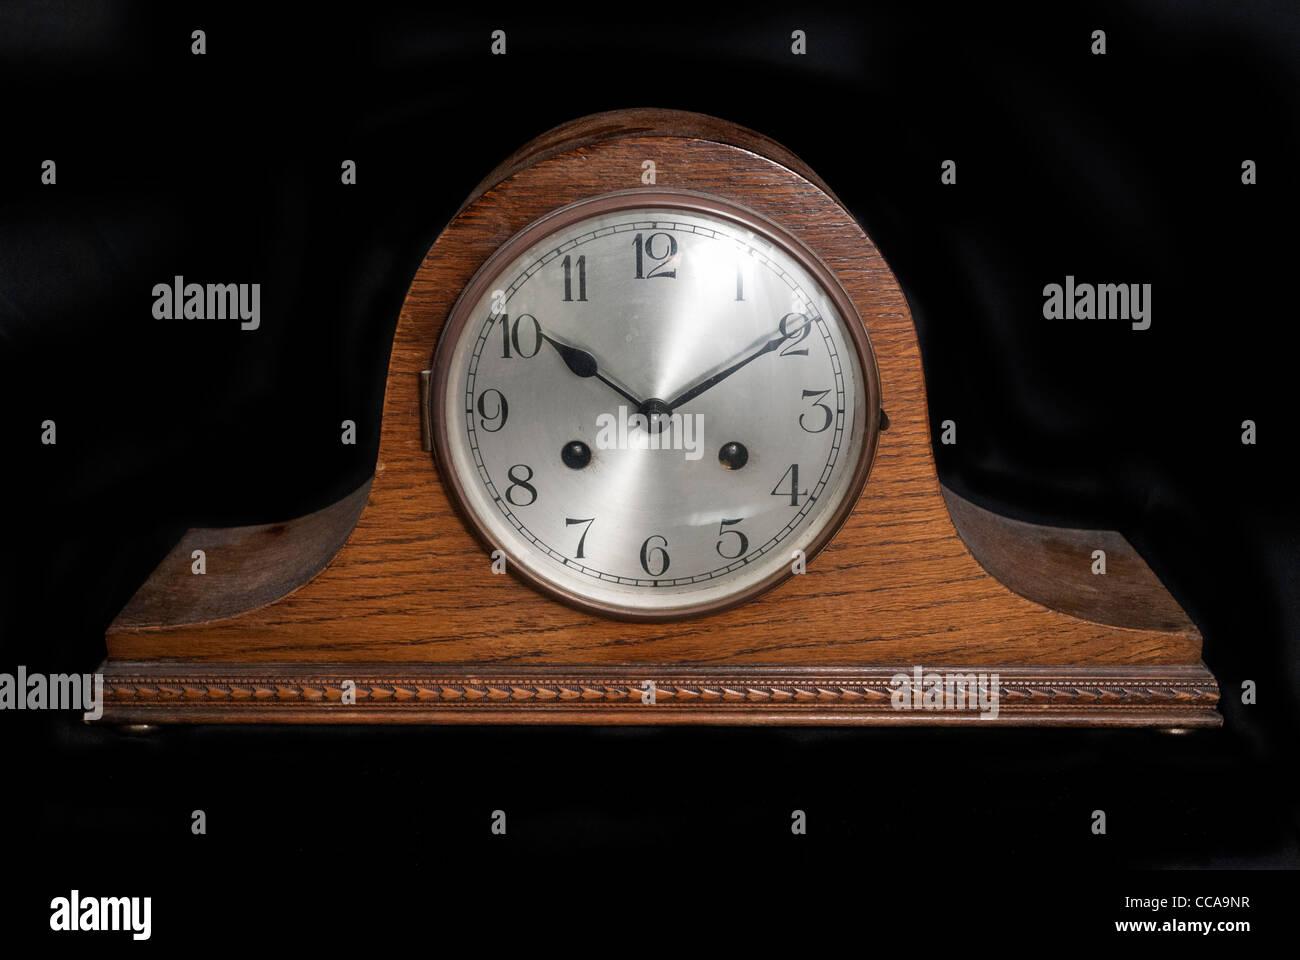 An antique clock mantelpiece. - Stock Image